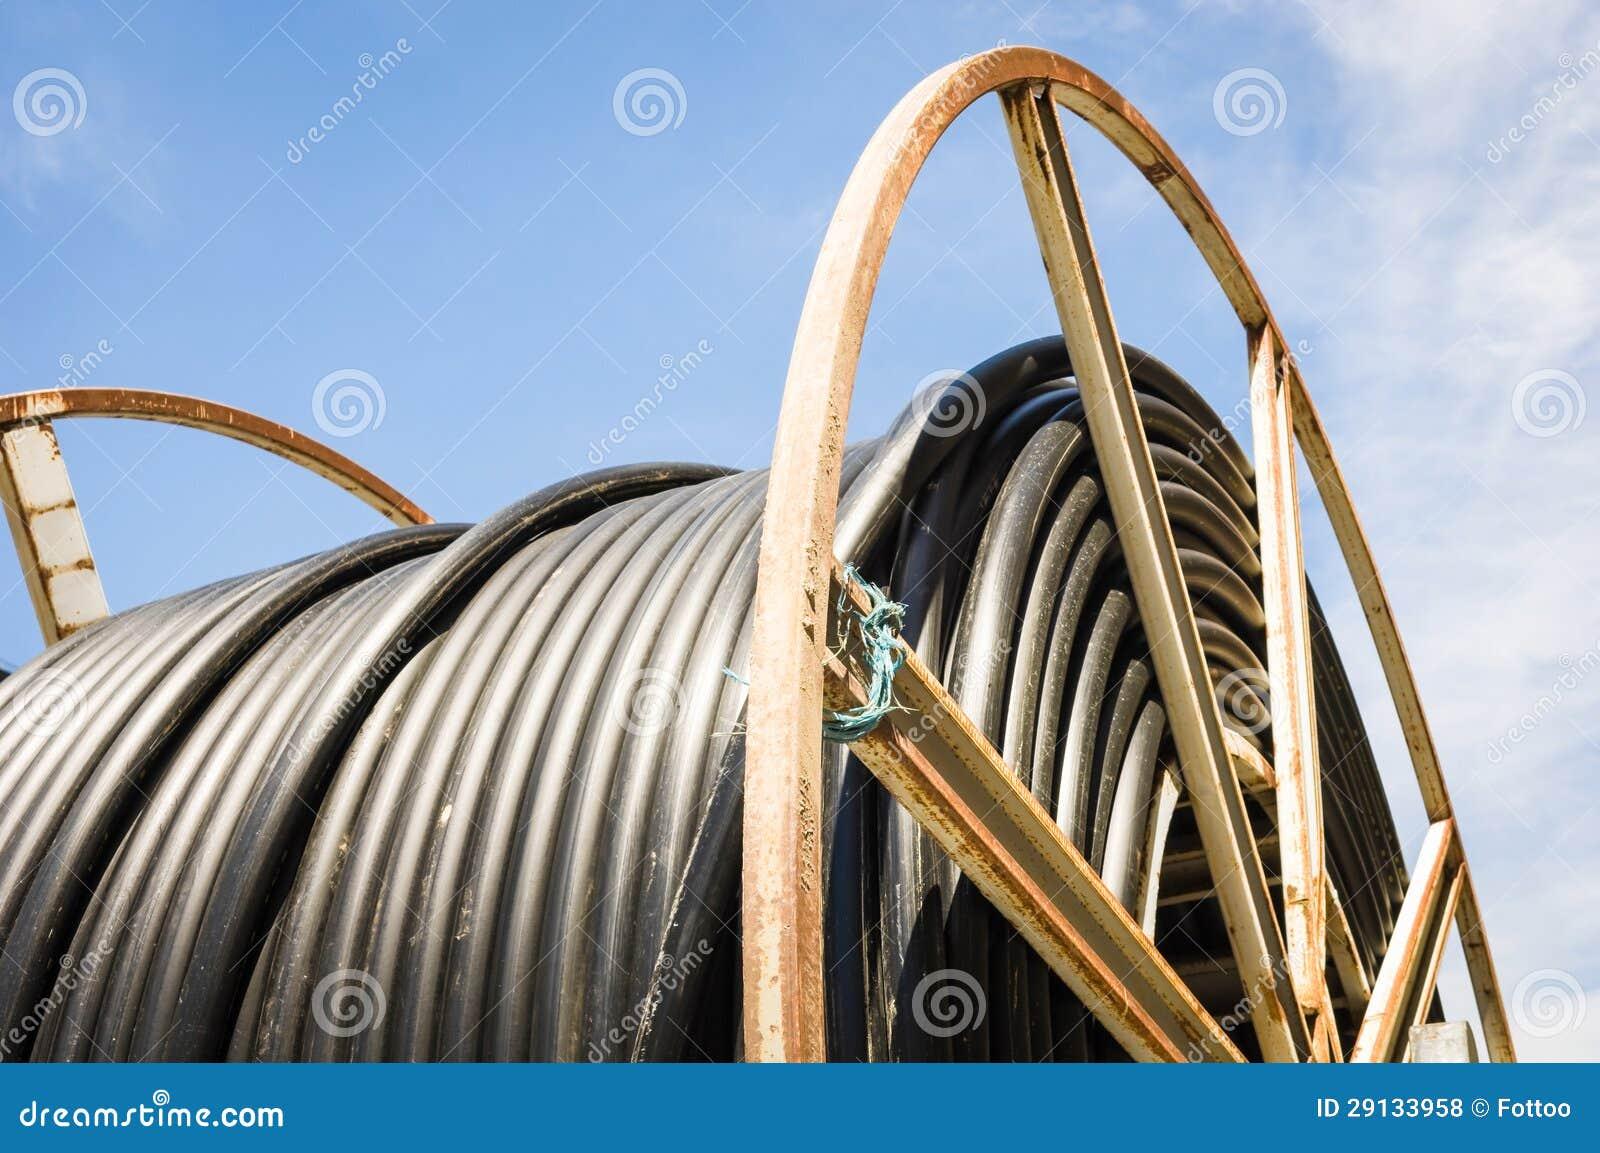 Kabel trummar